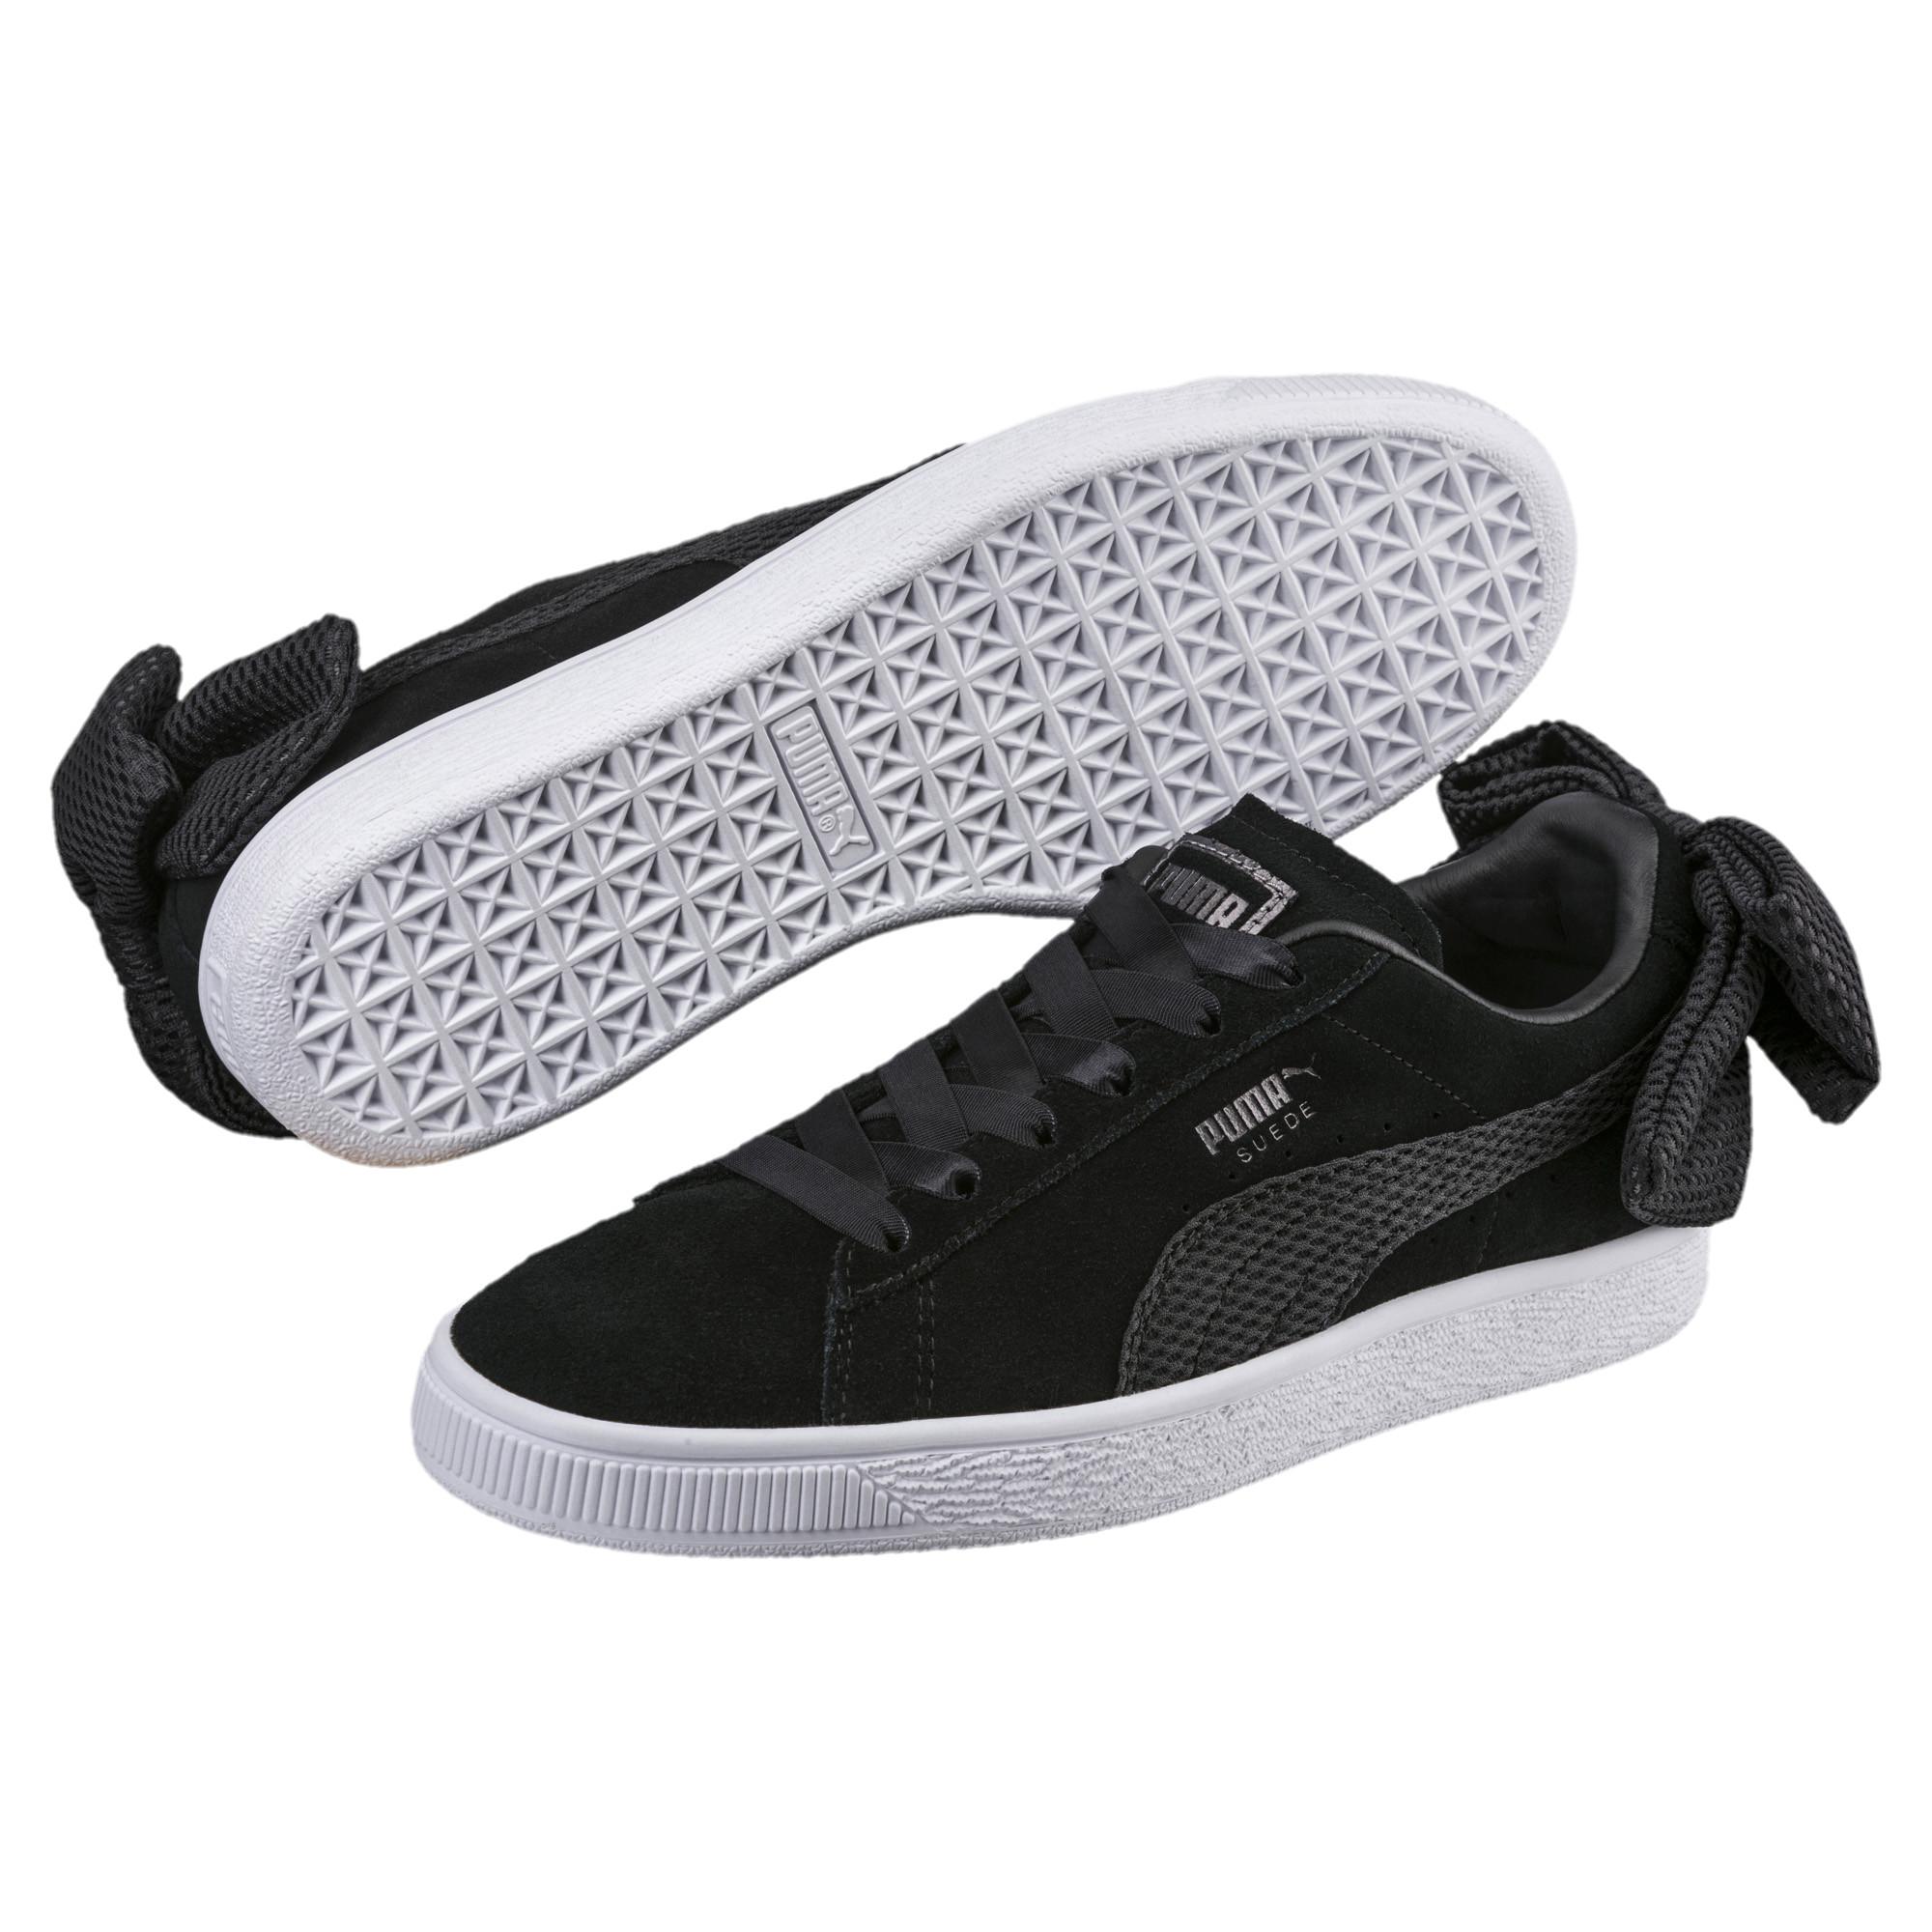 119b664ed8 Details about PUMA Suede Bow Uprising Women's Sneakers Women Shoe Sport  Classics